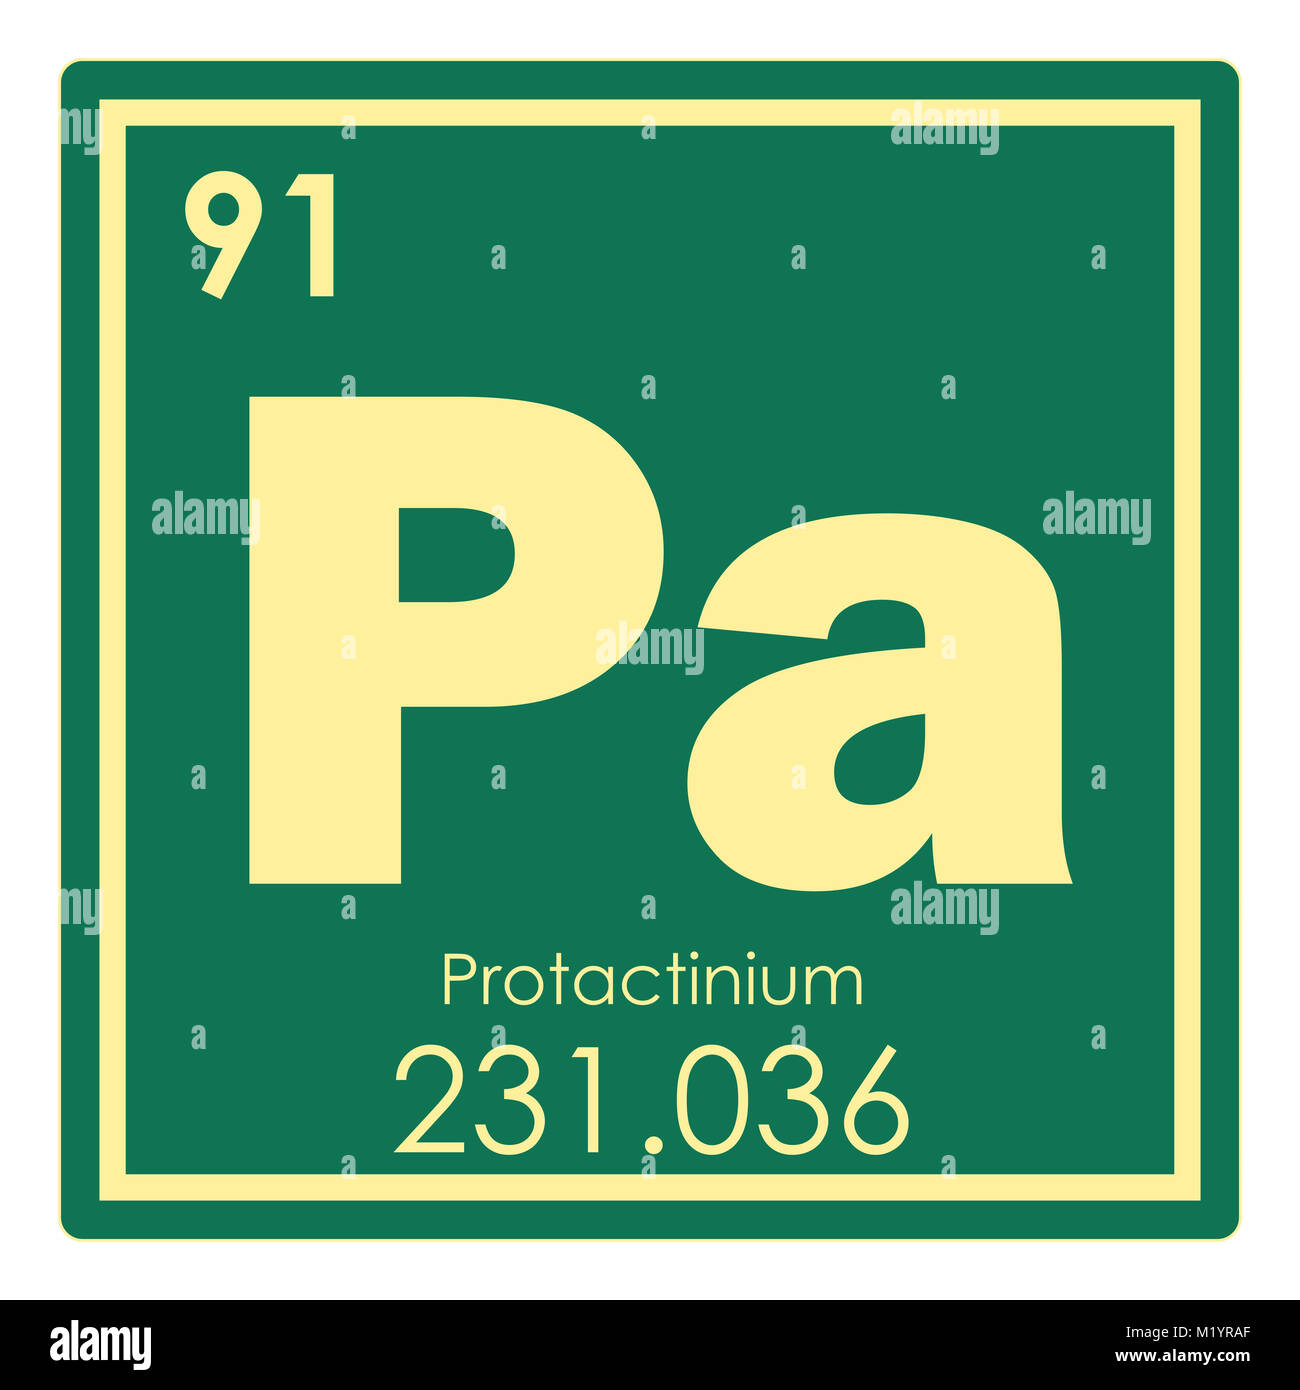 Protactinium imgenes de stock protactinium fotos de stock alamy protactinio elemento qumico tabla peridica ciencia smbolo imagen de stock urtaz Image collections